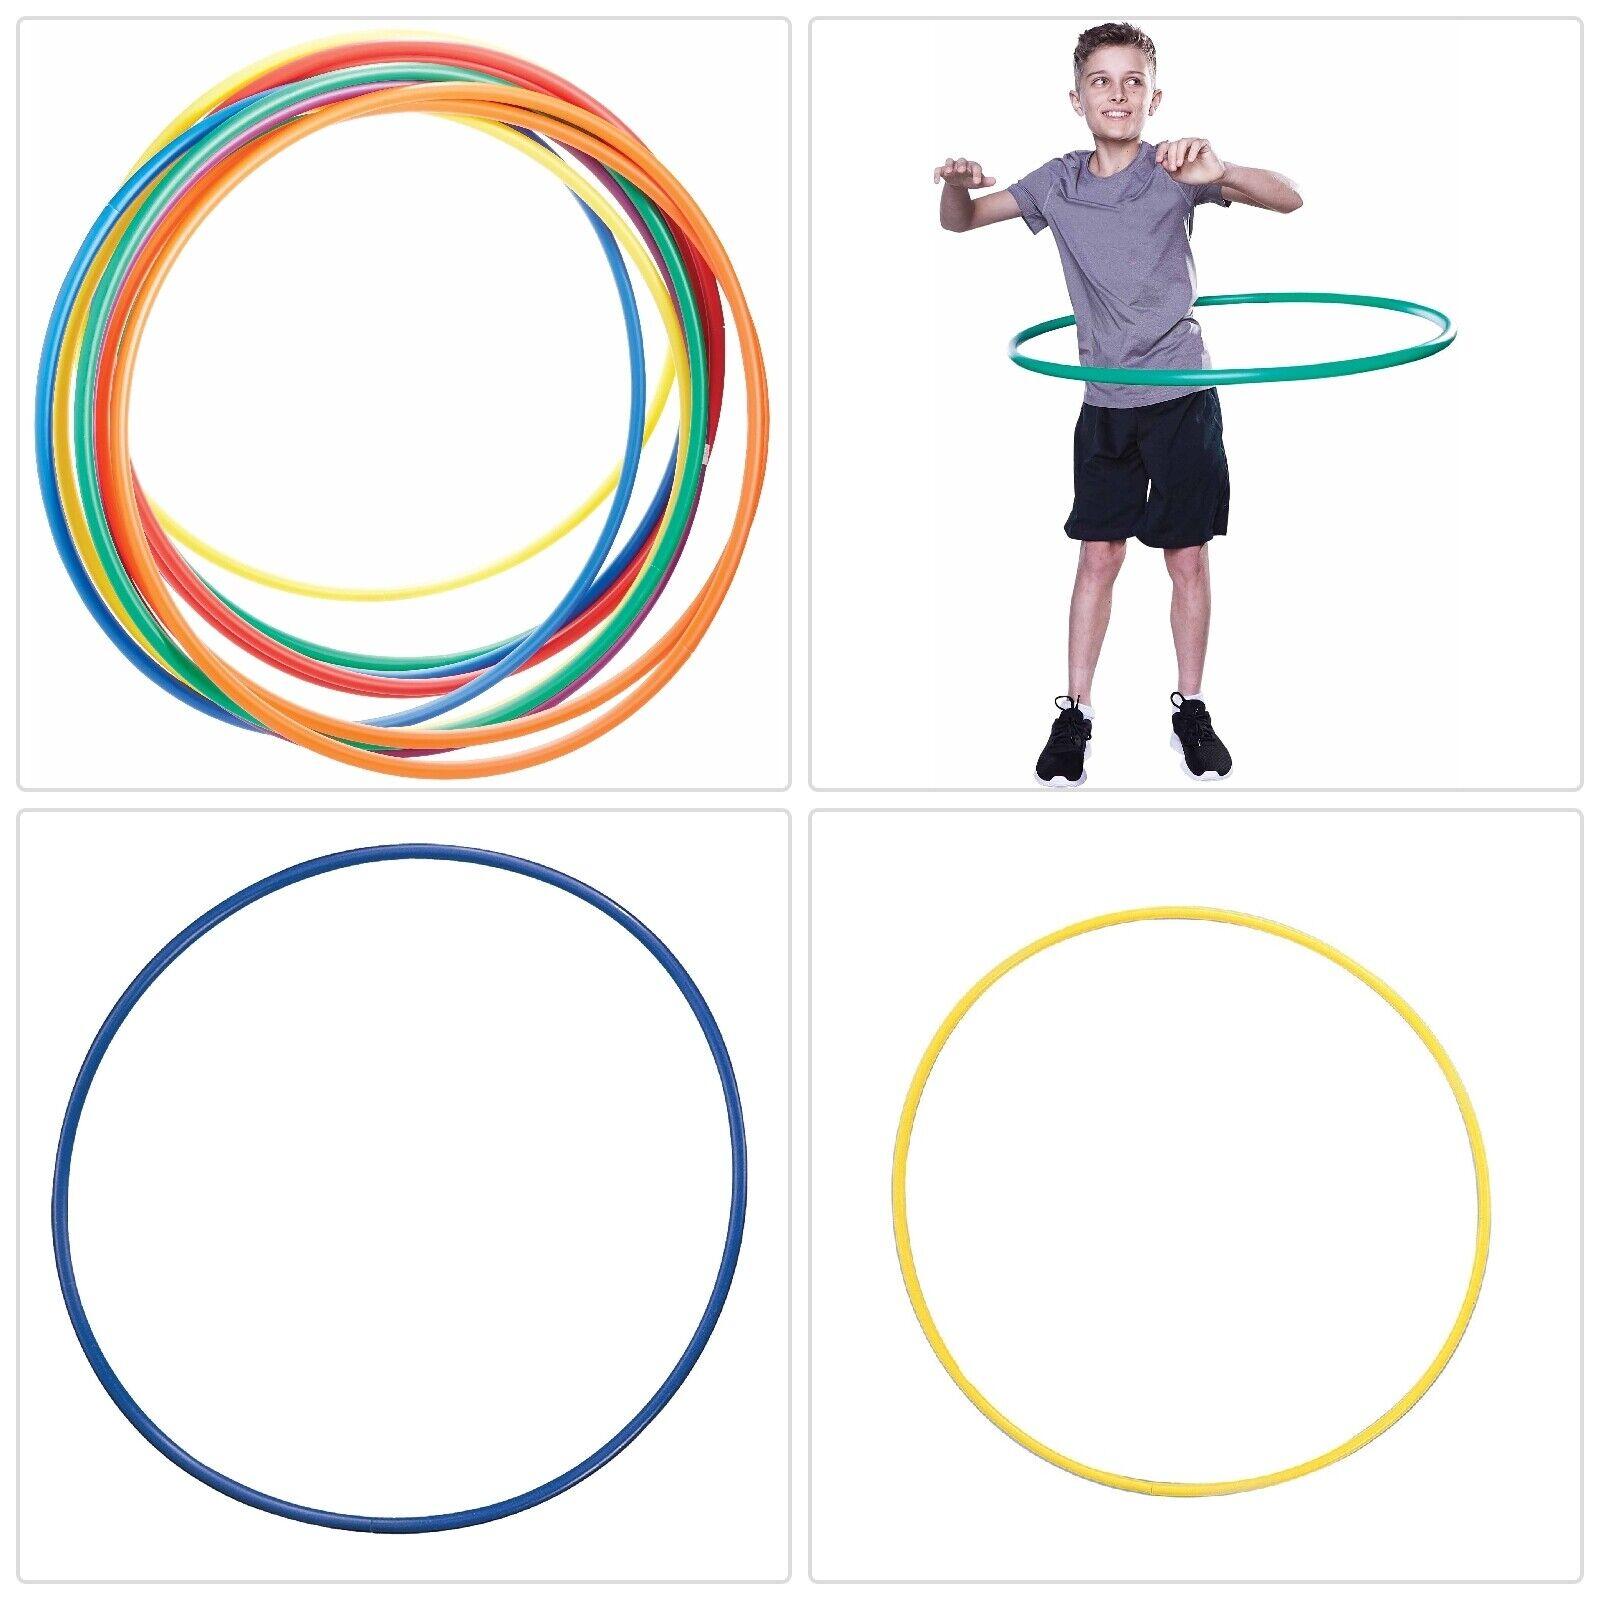 24  STANDARD SIZE COLORFUL HULA HOOPS Set Kids Fun Activity Multi Use Hop Rings